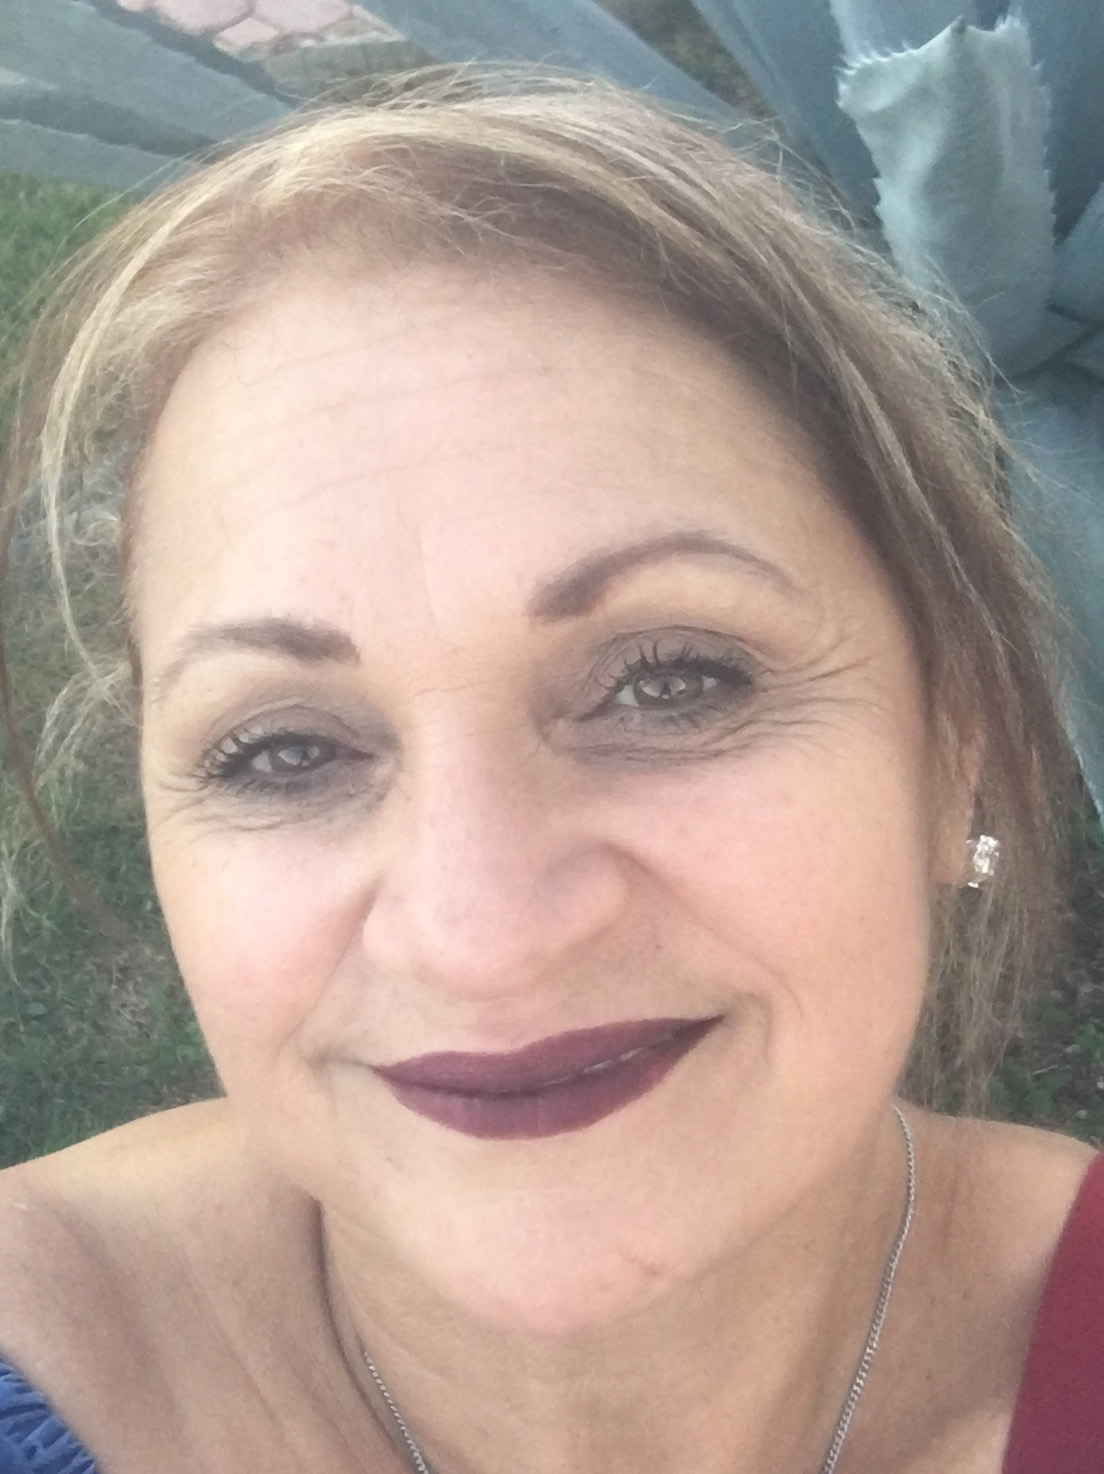 Dalila Irizarry